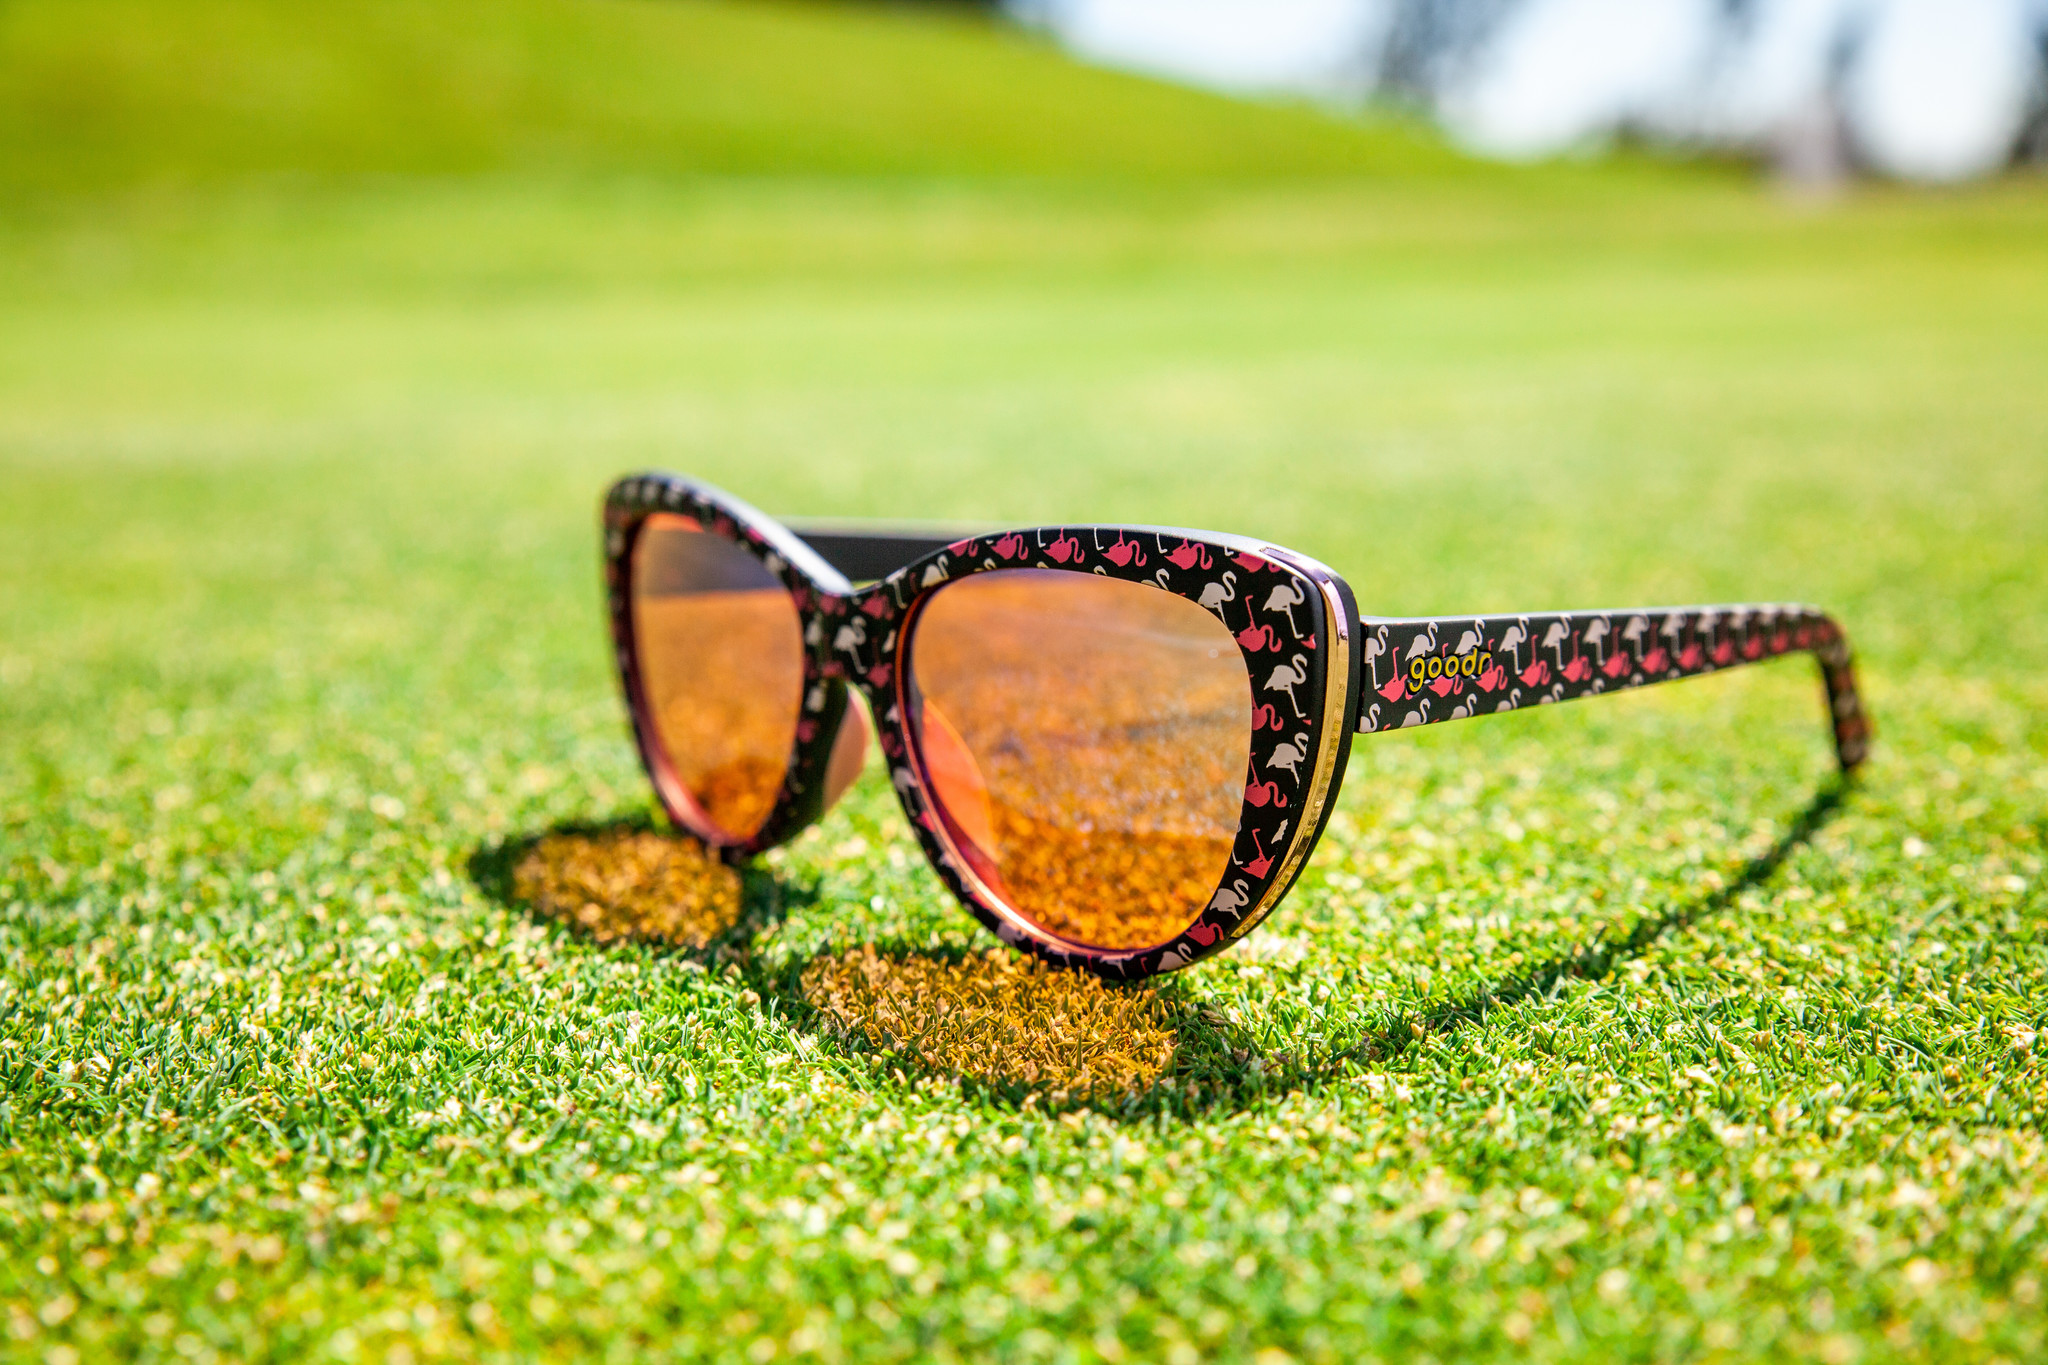 goodr Runway goodr Sunglasses - Gopher a Flamingo!